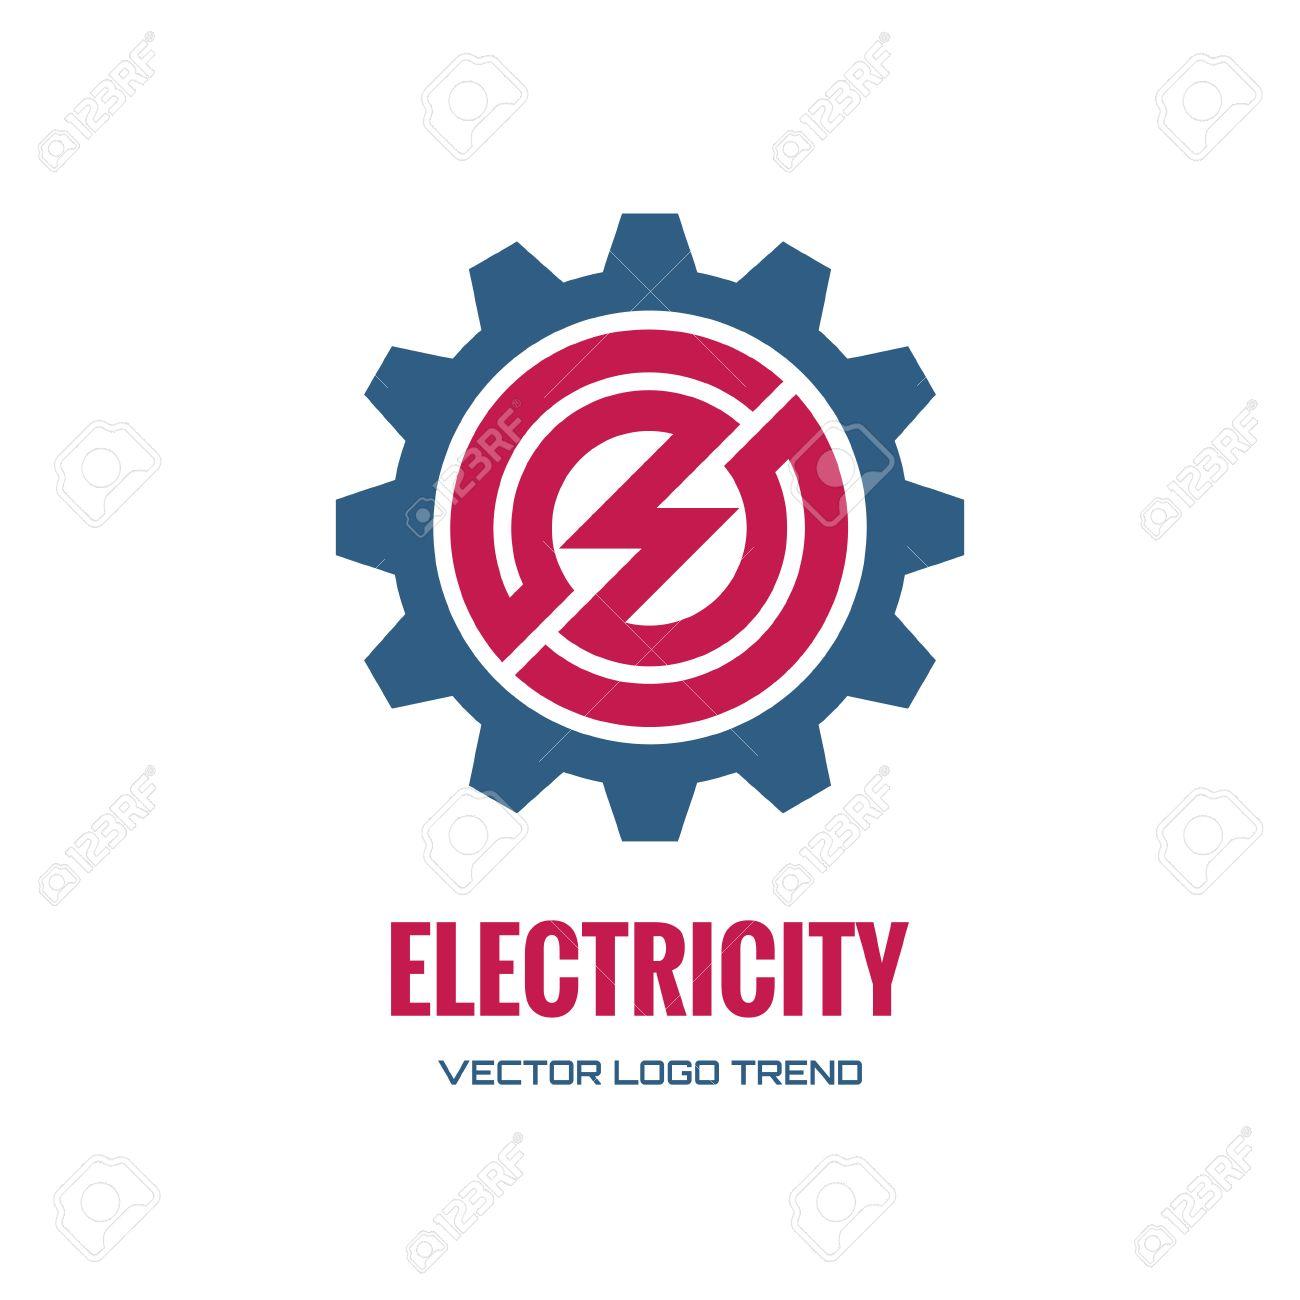 Elektrizität - Vektor-Konzept-Abbildung. Zahnrad-Symbol. Lizenzfrei ...